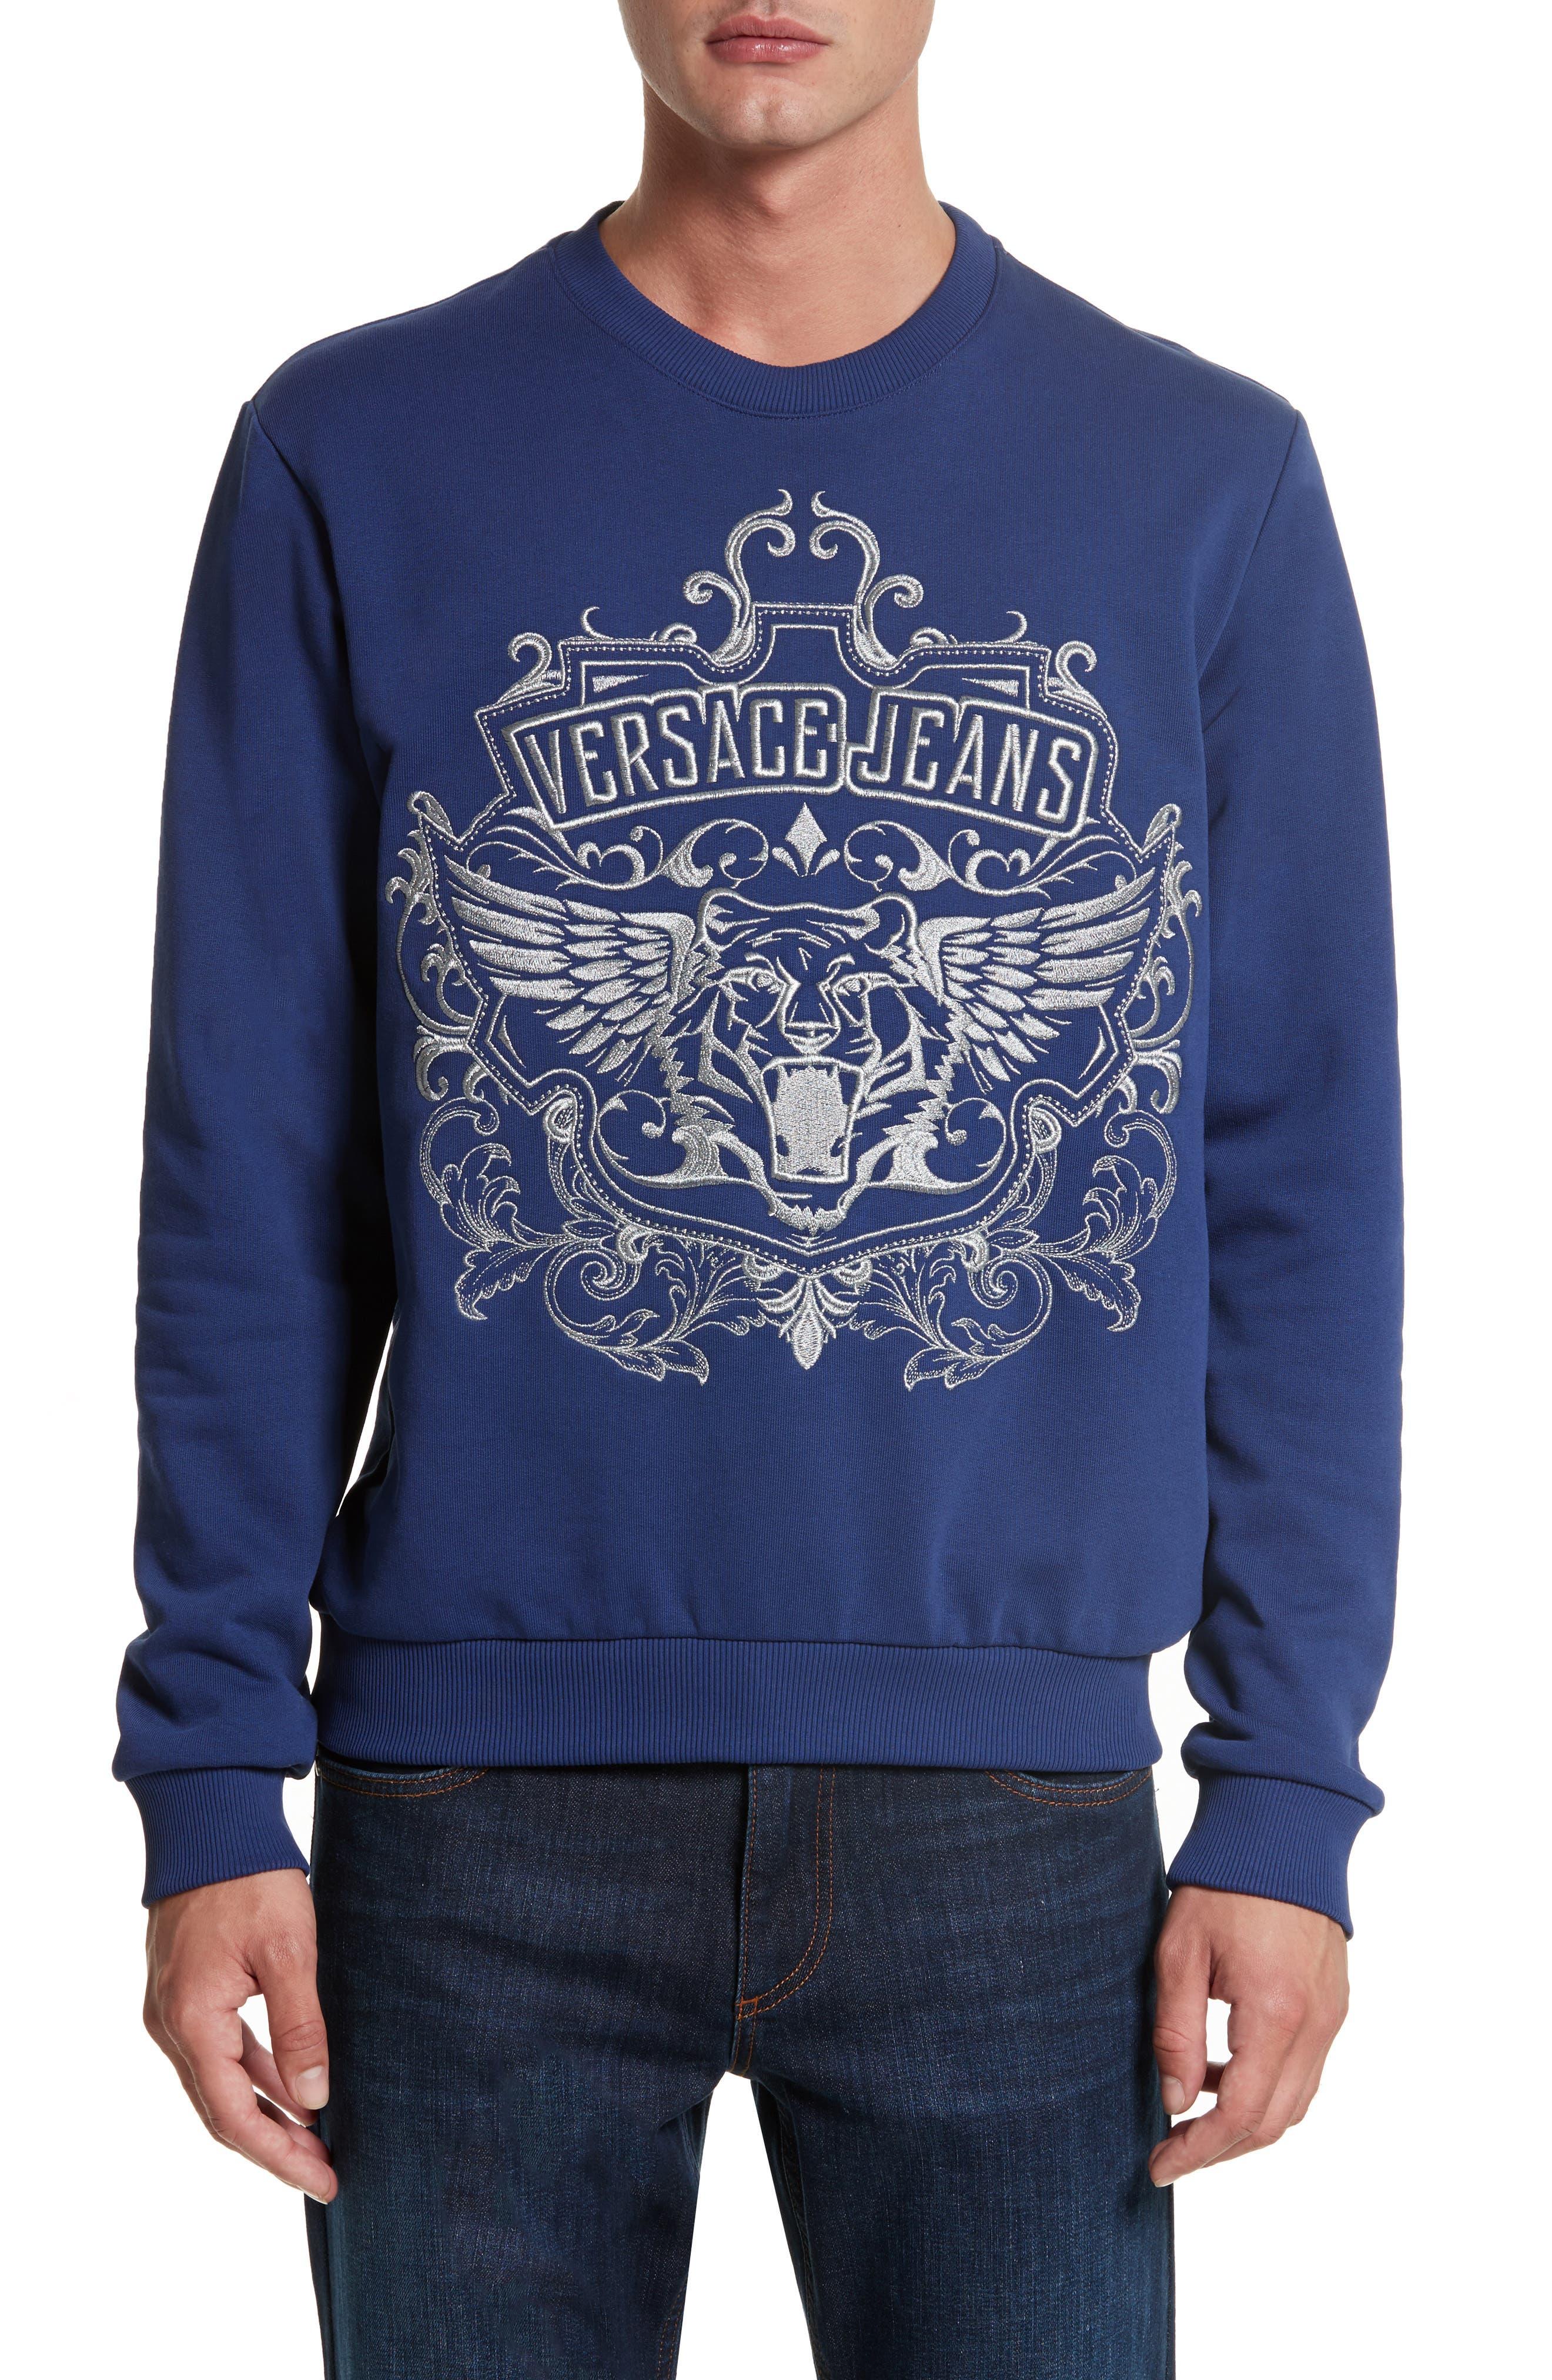 Main Image - Versace Jeans Embroidered Crewneck Sweatshirt